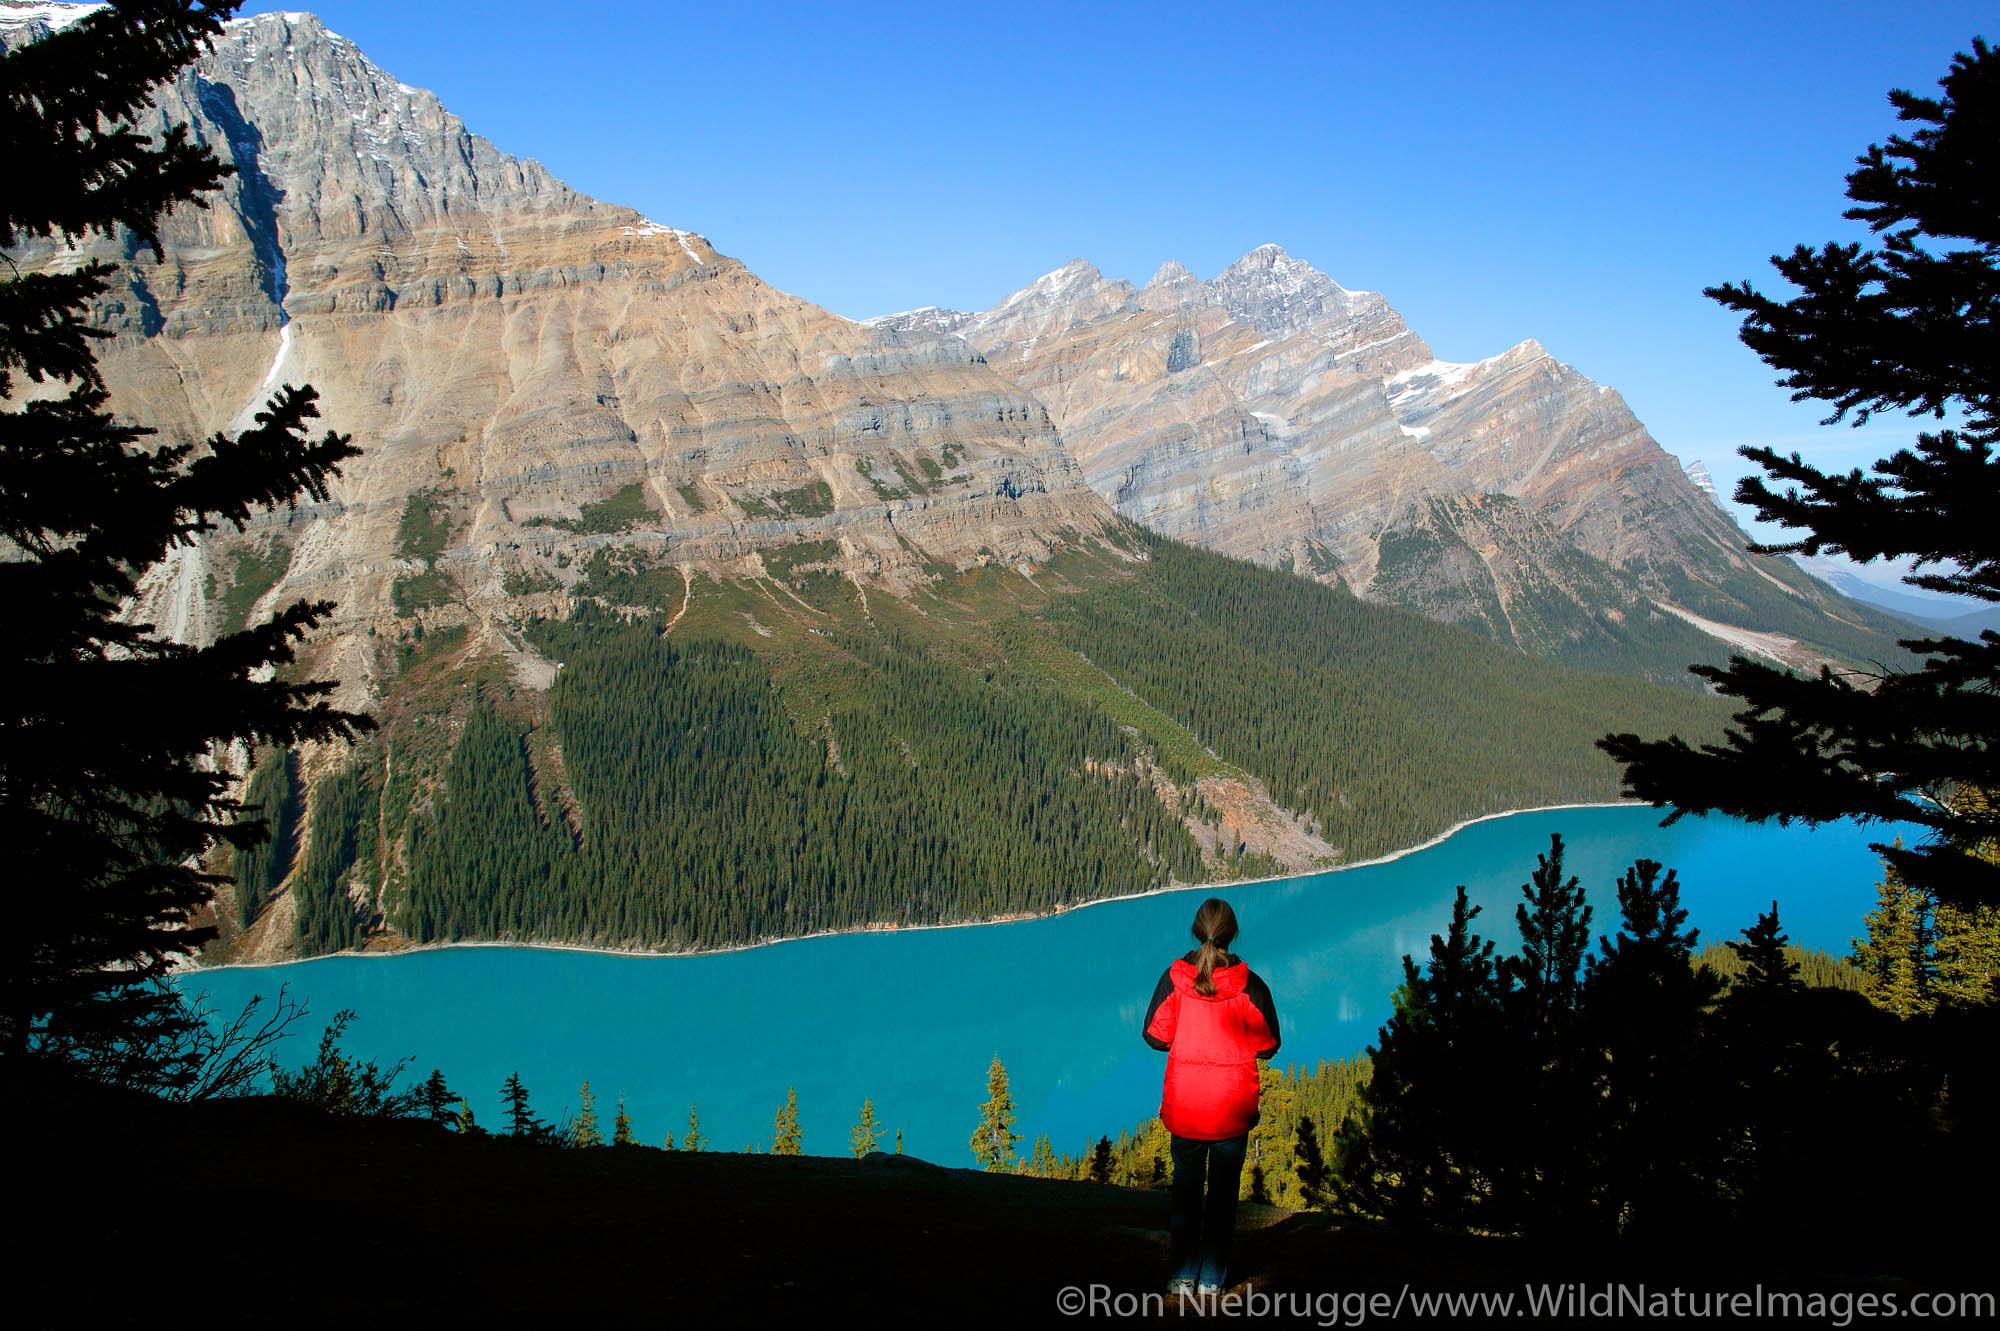 Visitor (MR) views Peyto Lake at Bow Summit, Banff National Park, Alberta, Canada.  Model Released.